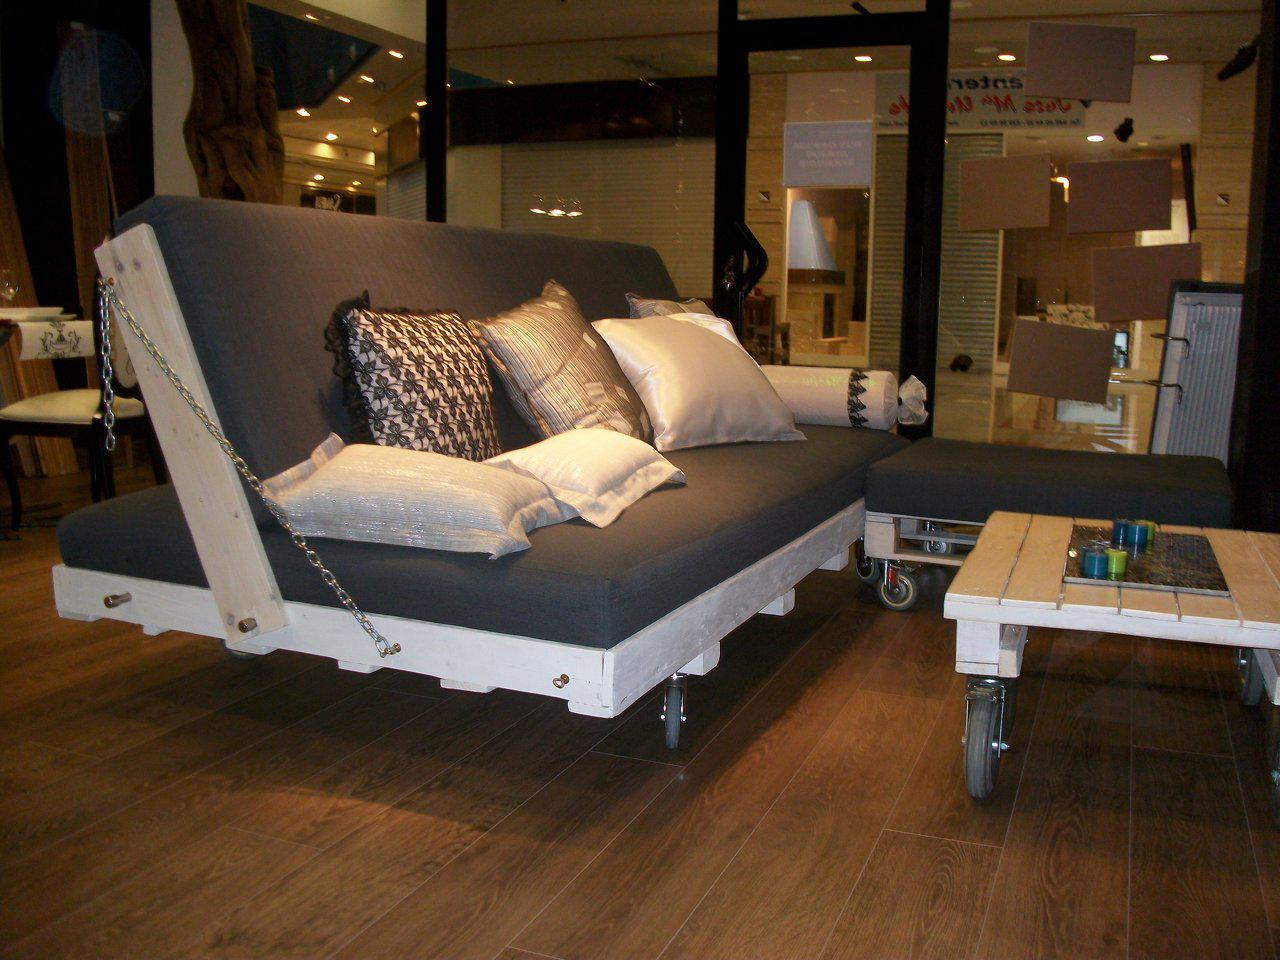 Sofa Cama Con Palets Nkde sofa Cama Con Palets Simple Fresh Muebles Pallets Terraza Vangion